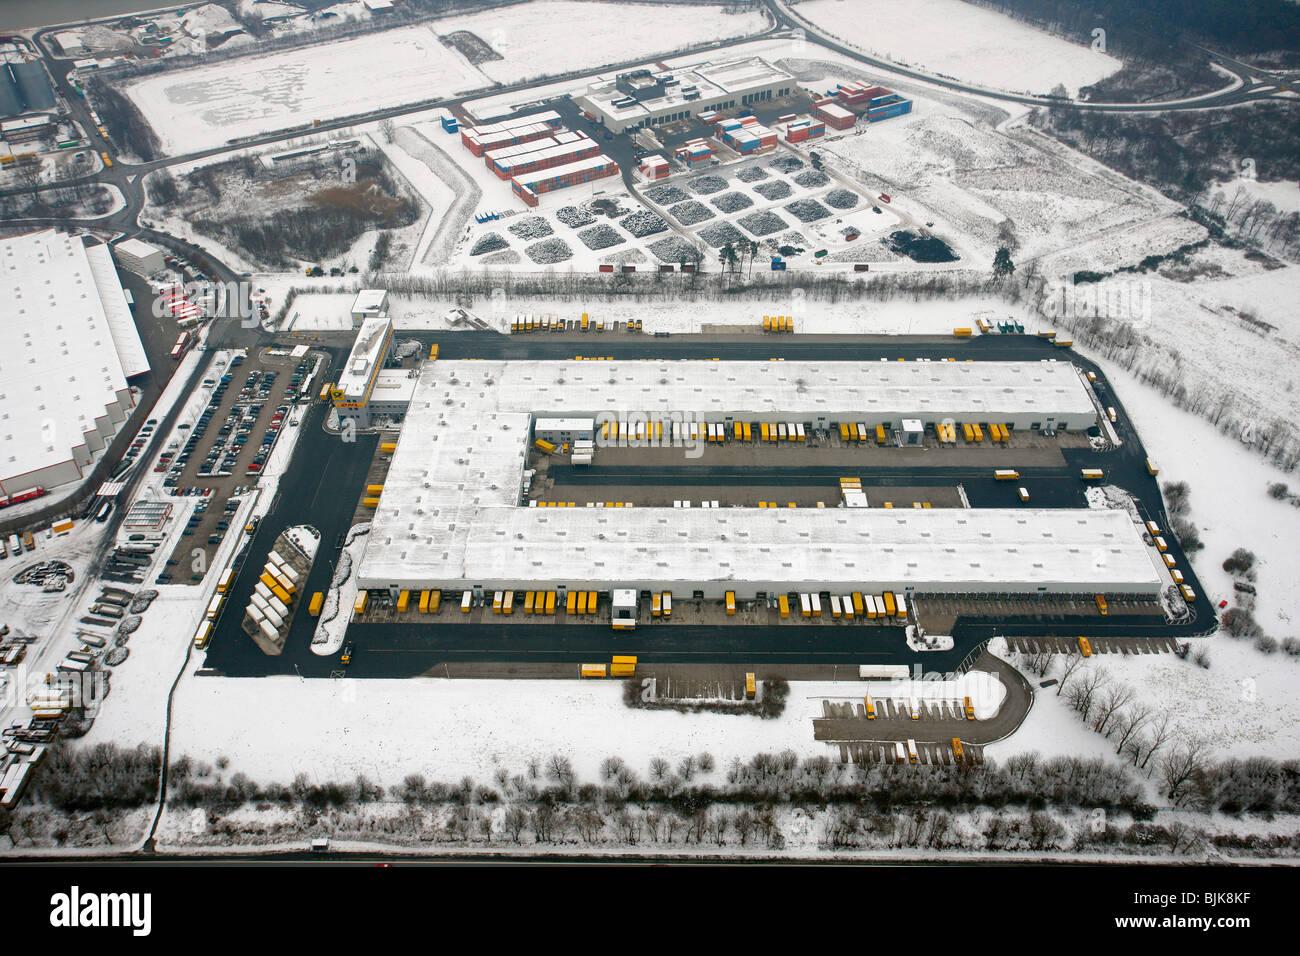 Aerial view, snow, DHL vehicle fleet, Hervest, Dorsten, Ruhrgebiet area, North Rhine-Westphalia, Germany, Europe Stock Photo